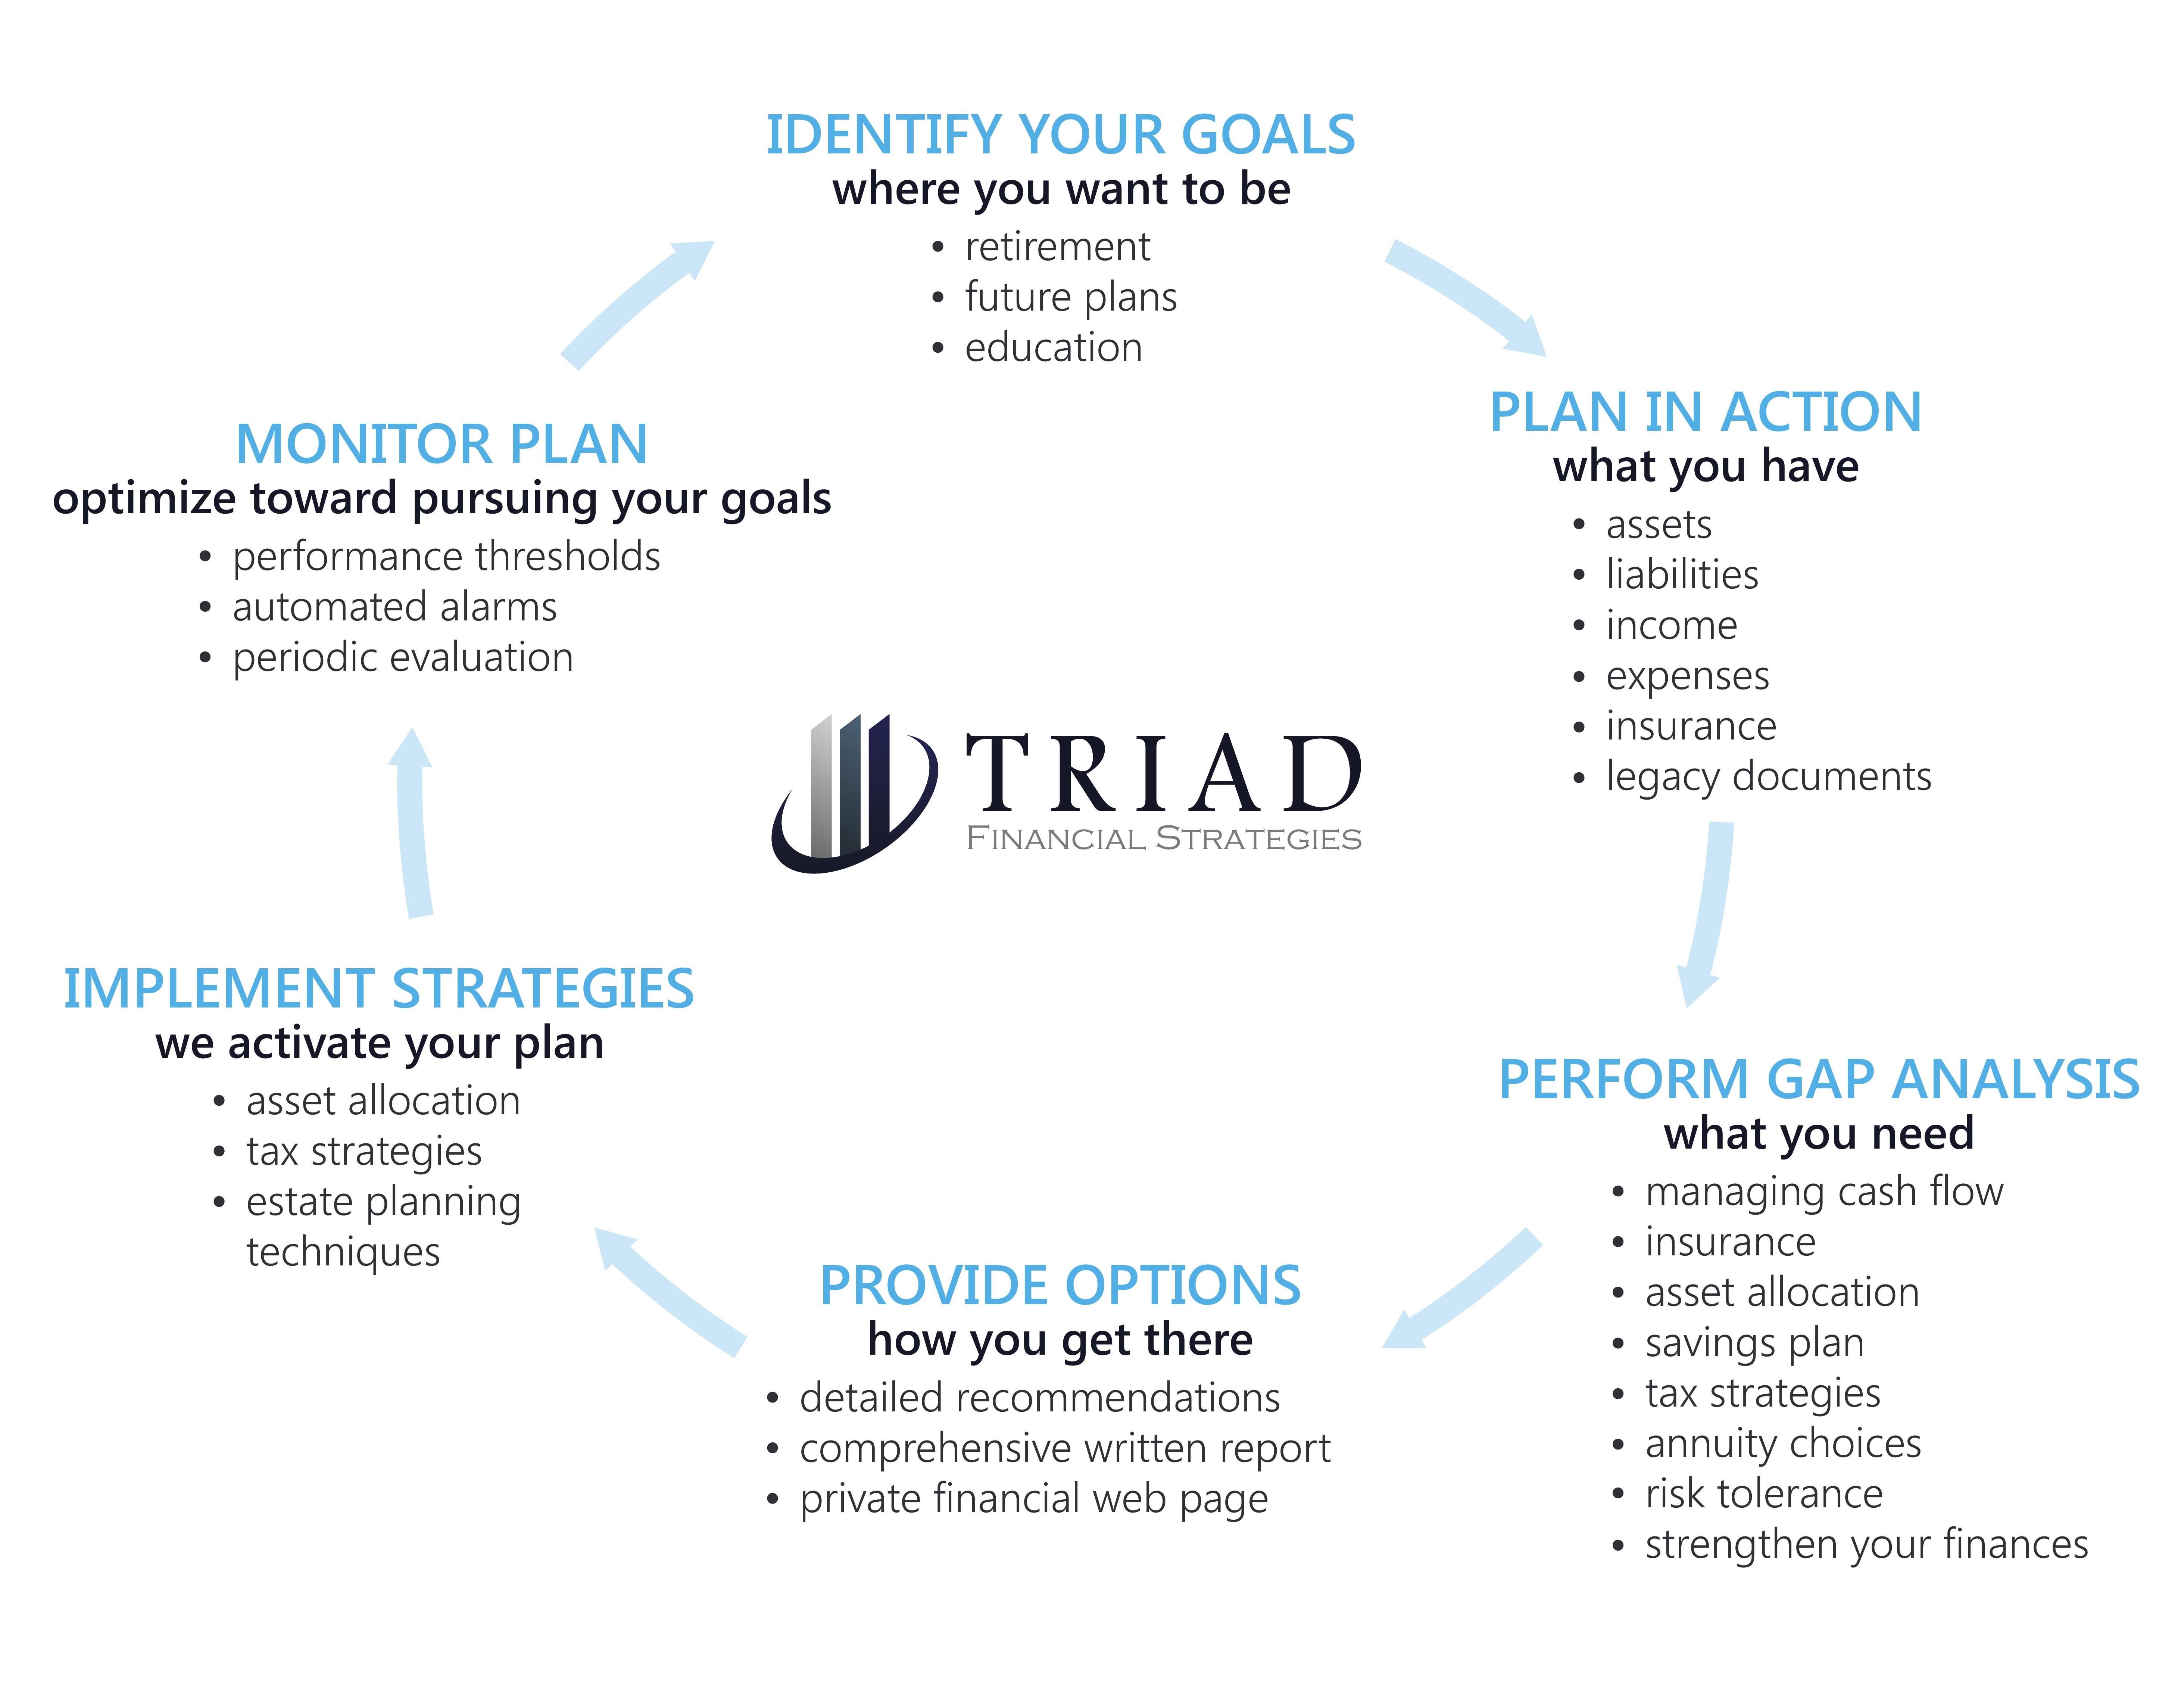 Triad Financial Strategies Planning Process